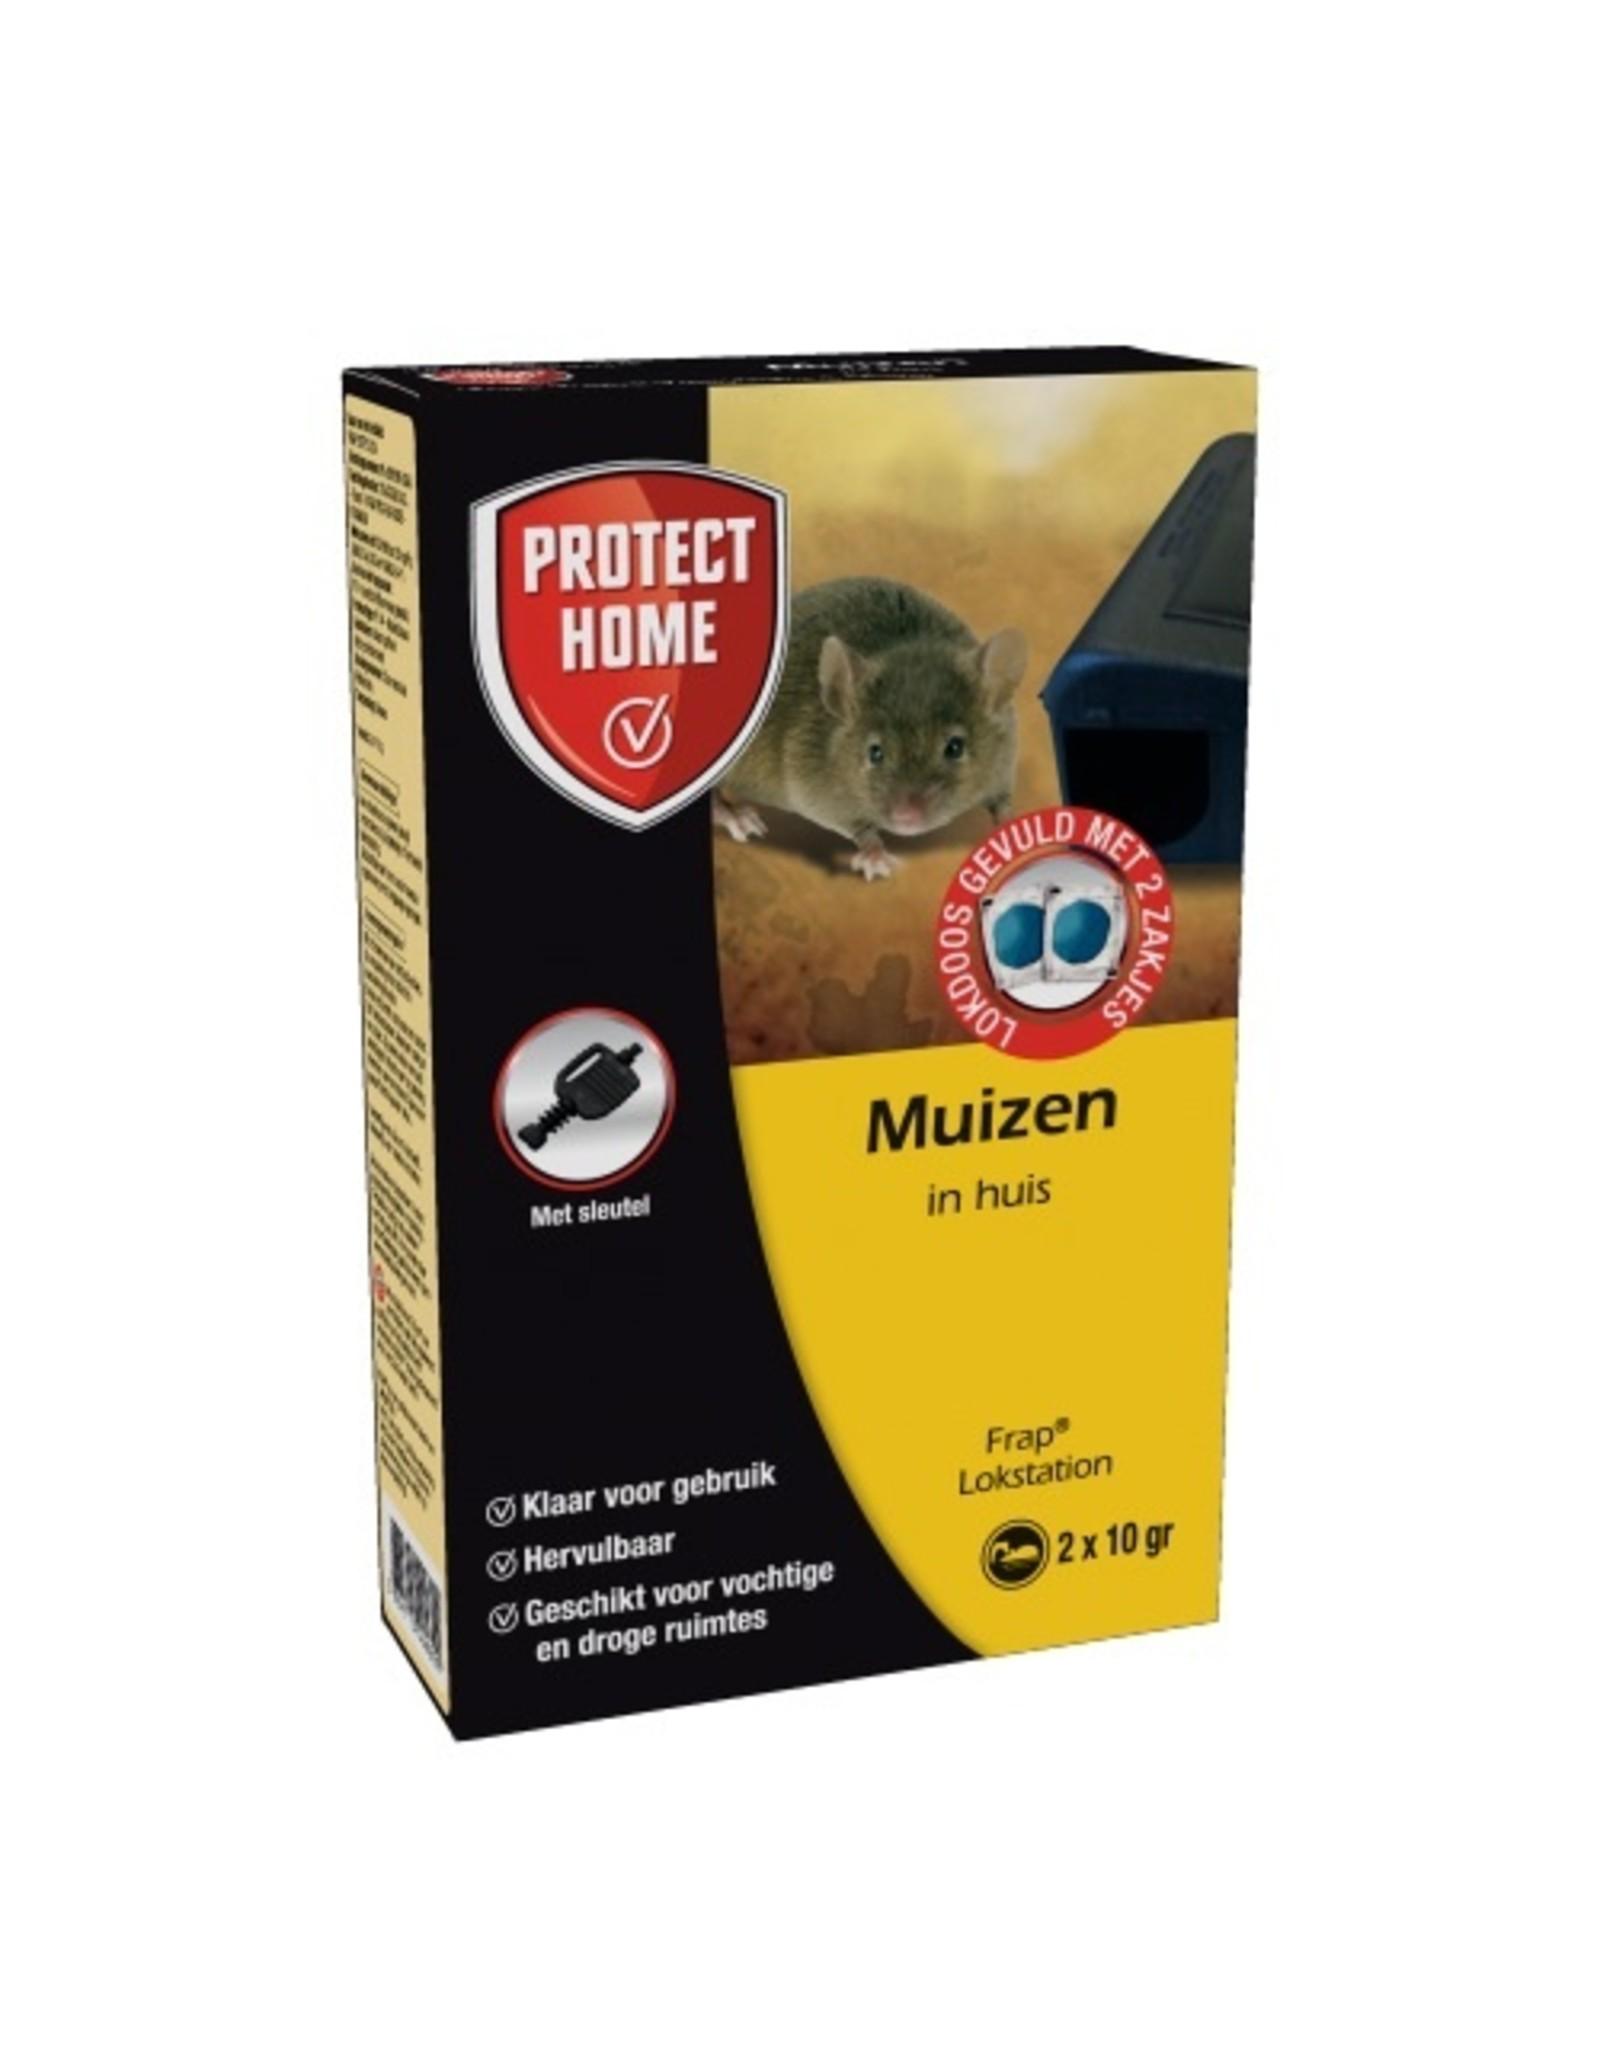 Protect Home Frap lokstation (incl. lokstof) 2x10 gram